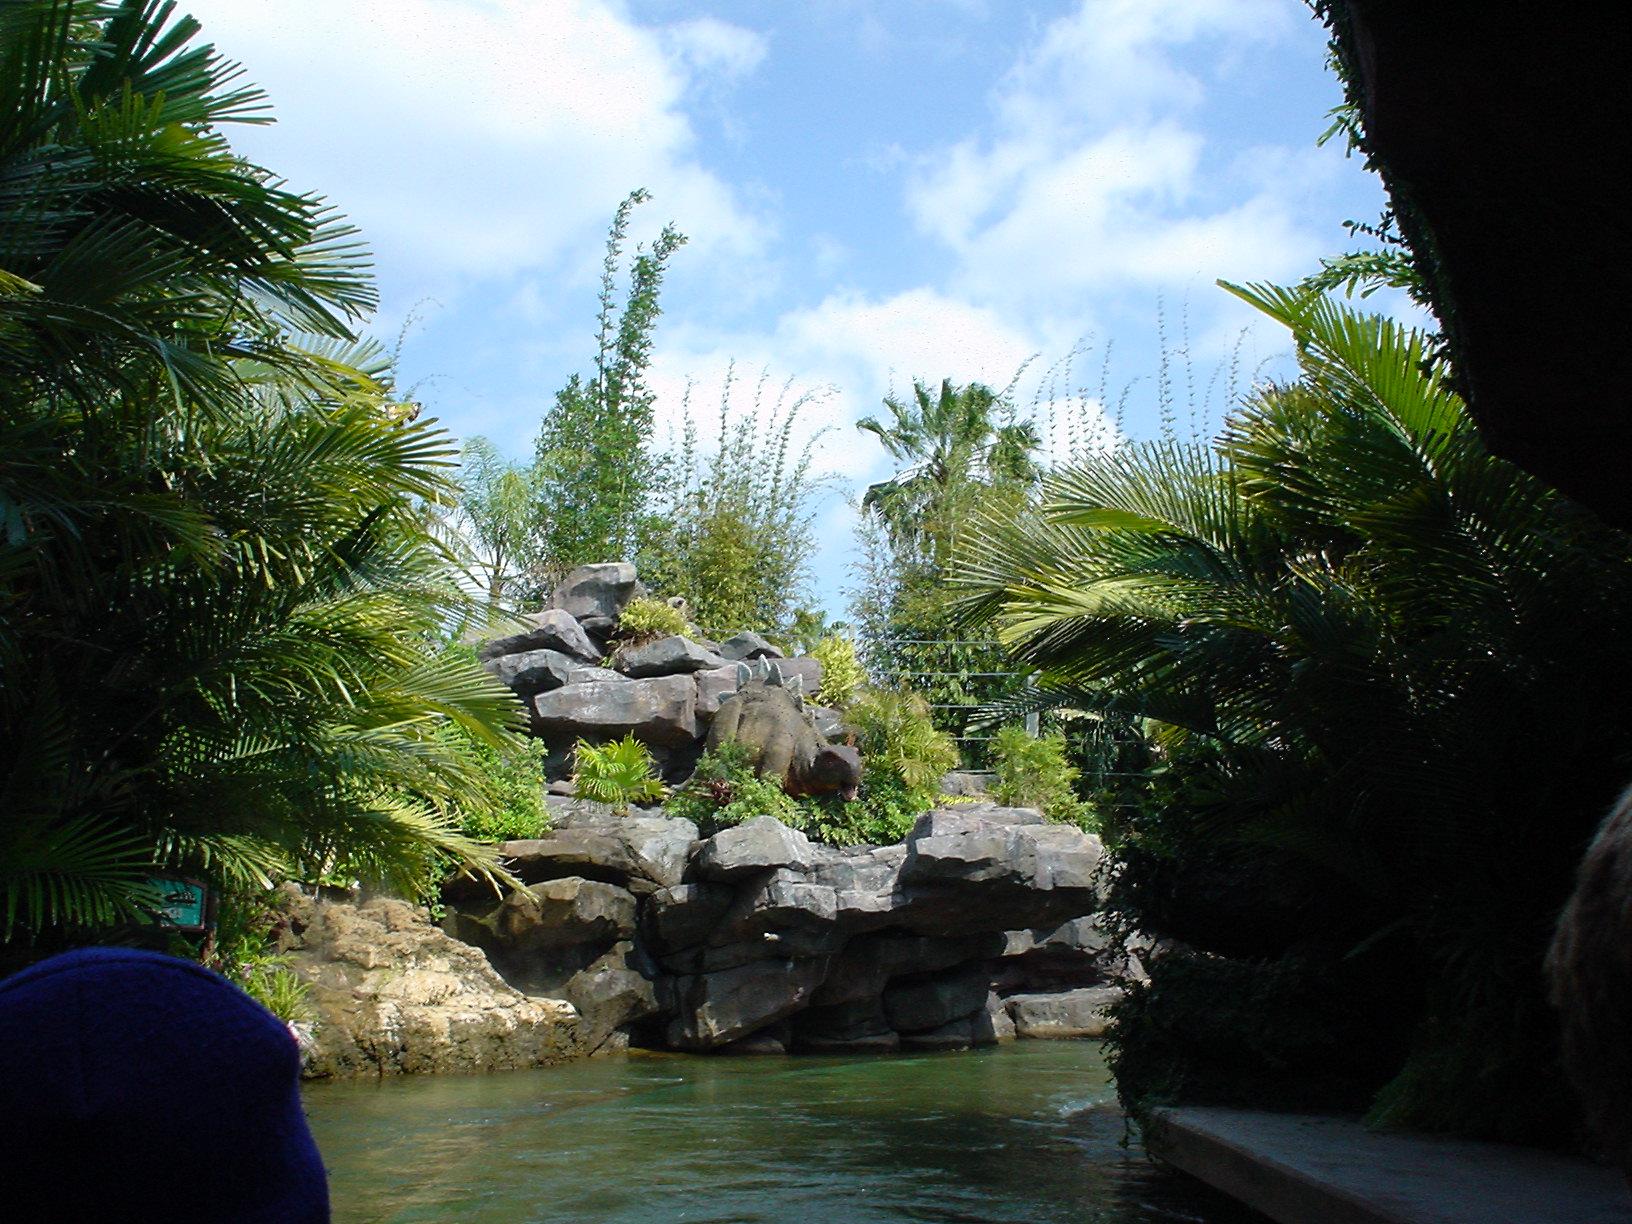 Orlando Florida 2004 Themeparks